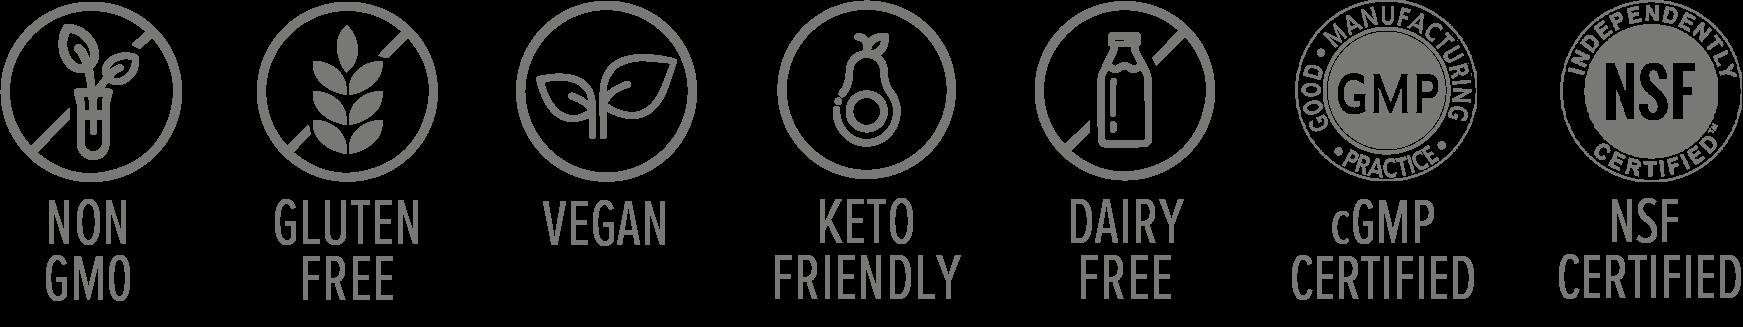 Velovita Zlēm: non gmo, glutern free, vegan, keto friendly, dairy free, cgmp free, certified nsf